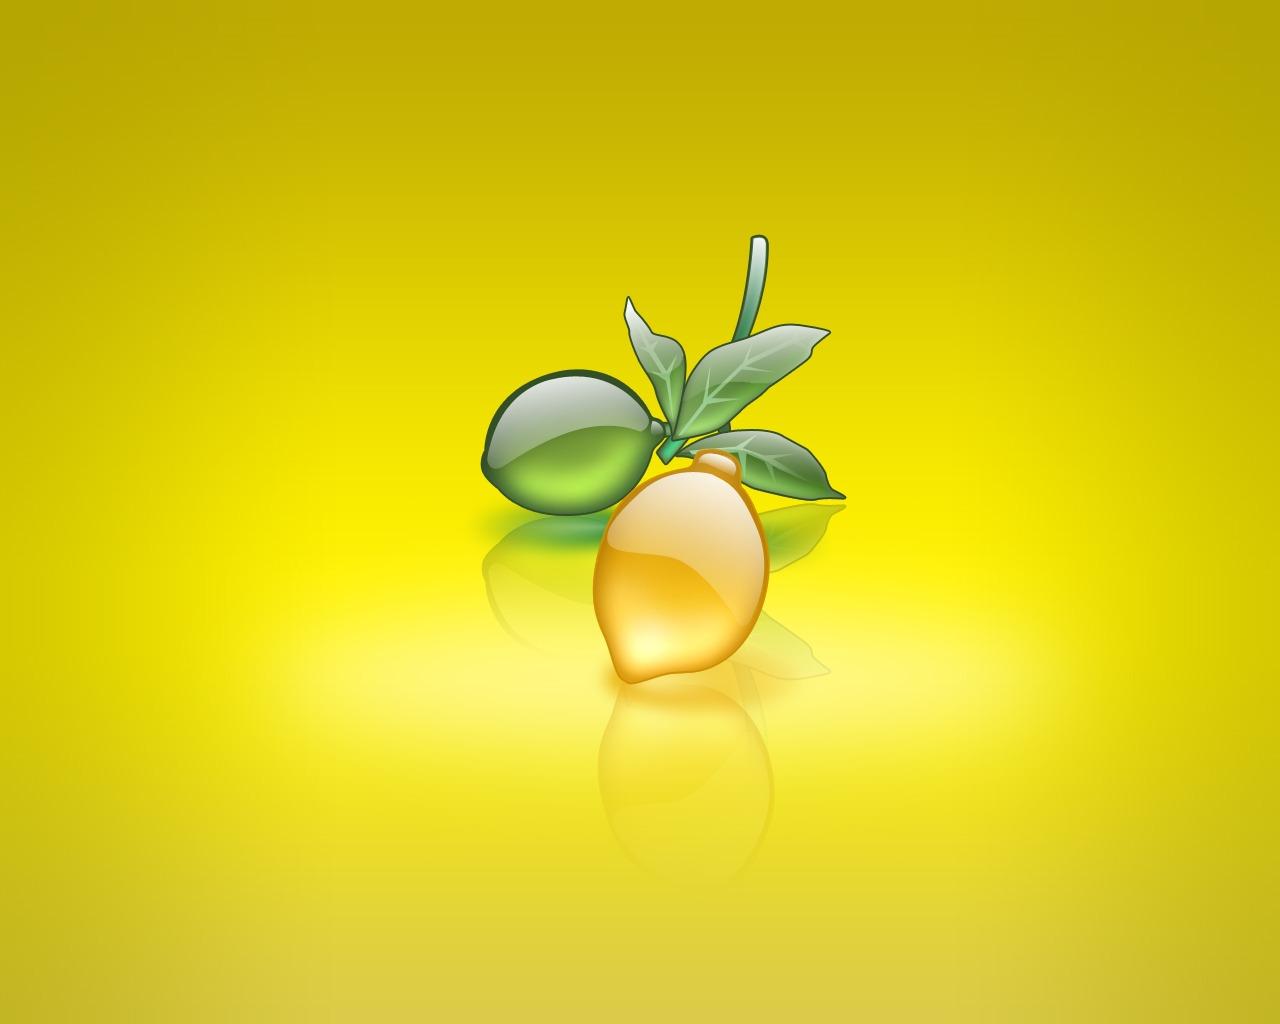 Download Wallpaper 720x1280 Lemon, Citrus, Sliced Samsung Galaxy ...